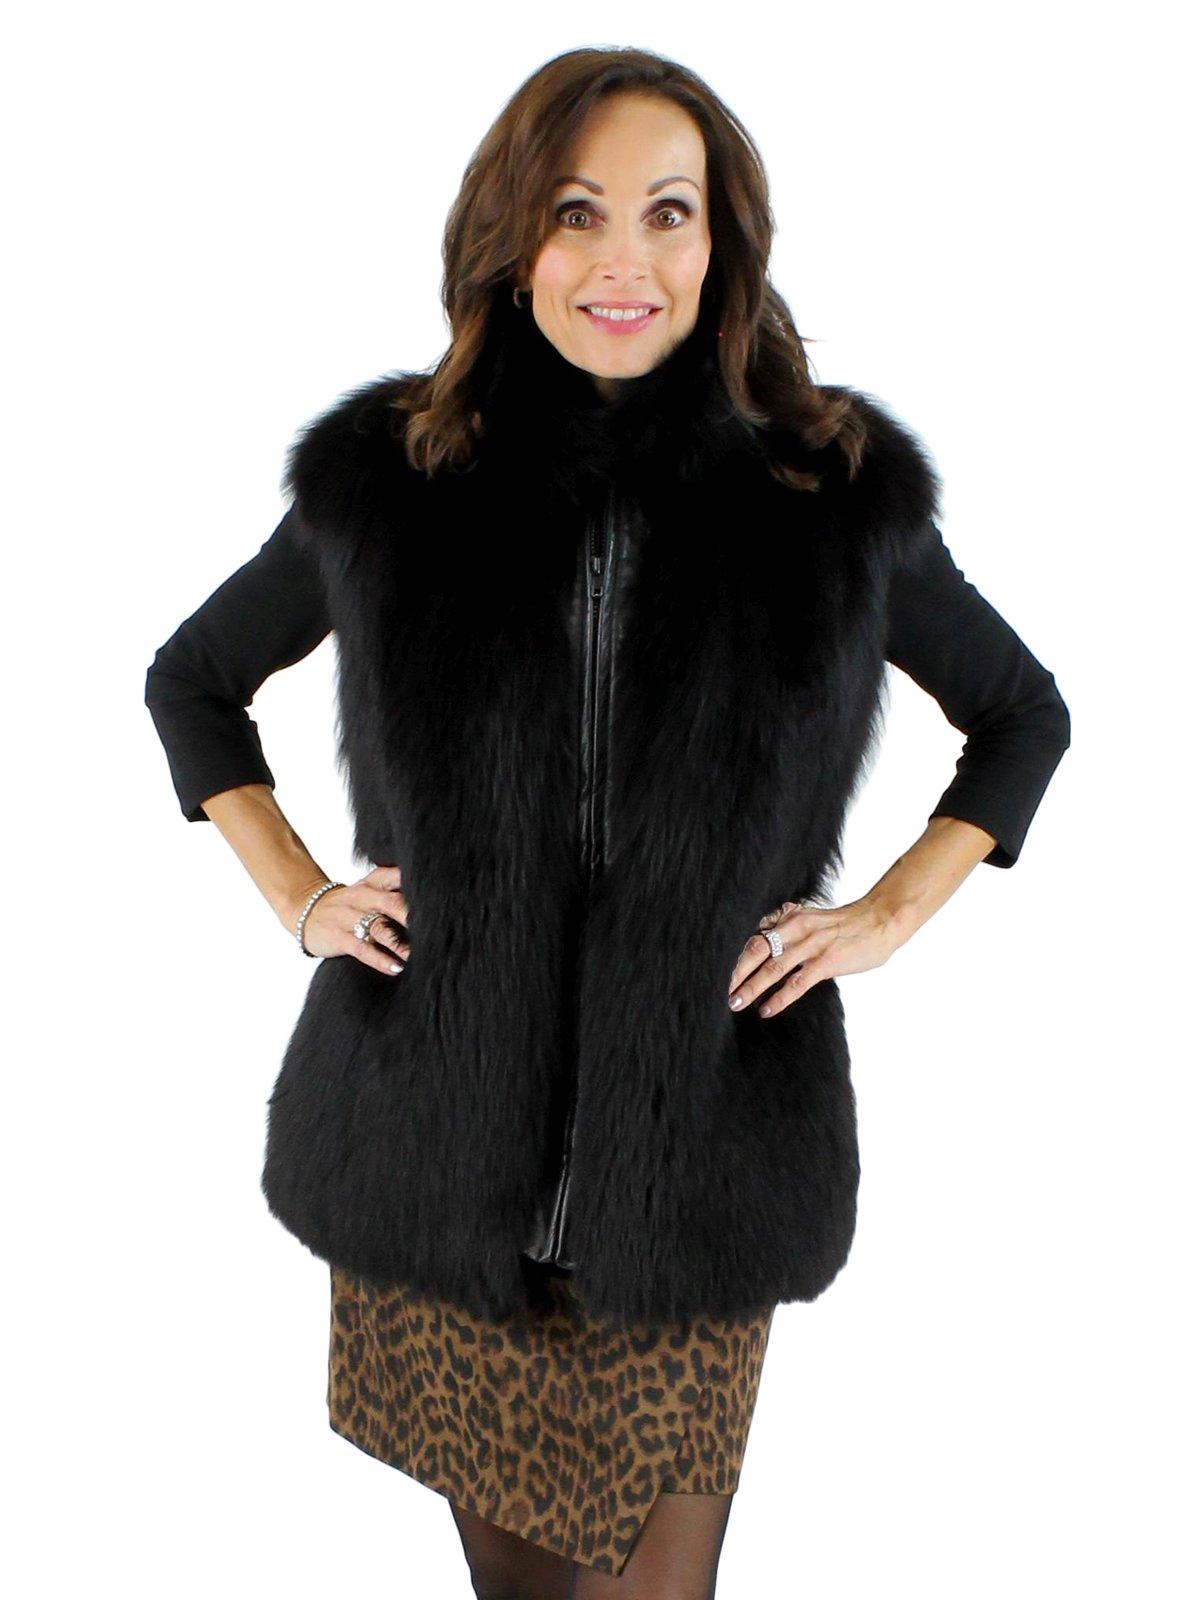 386bceced2 Fox Fur Vest - Women's Large - Black | Estate Furs